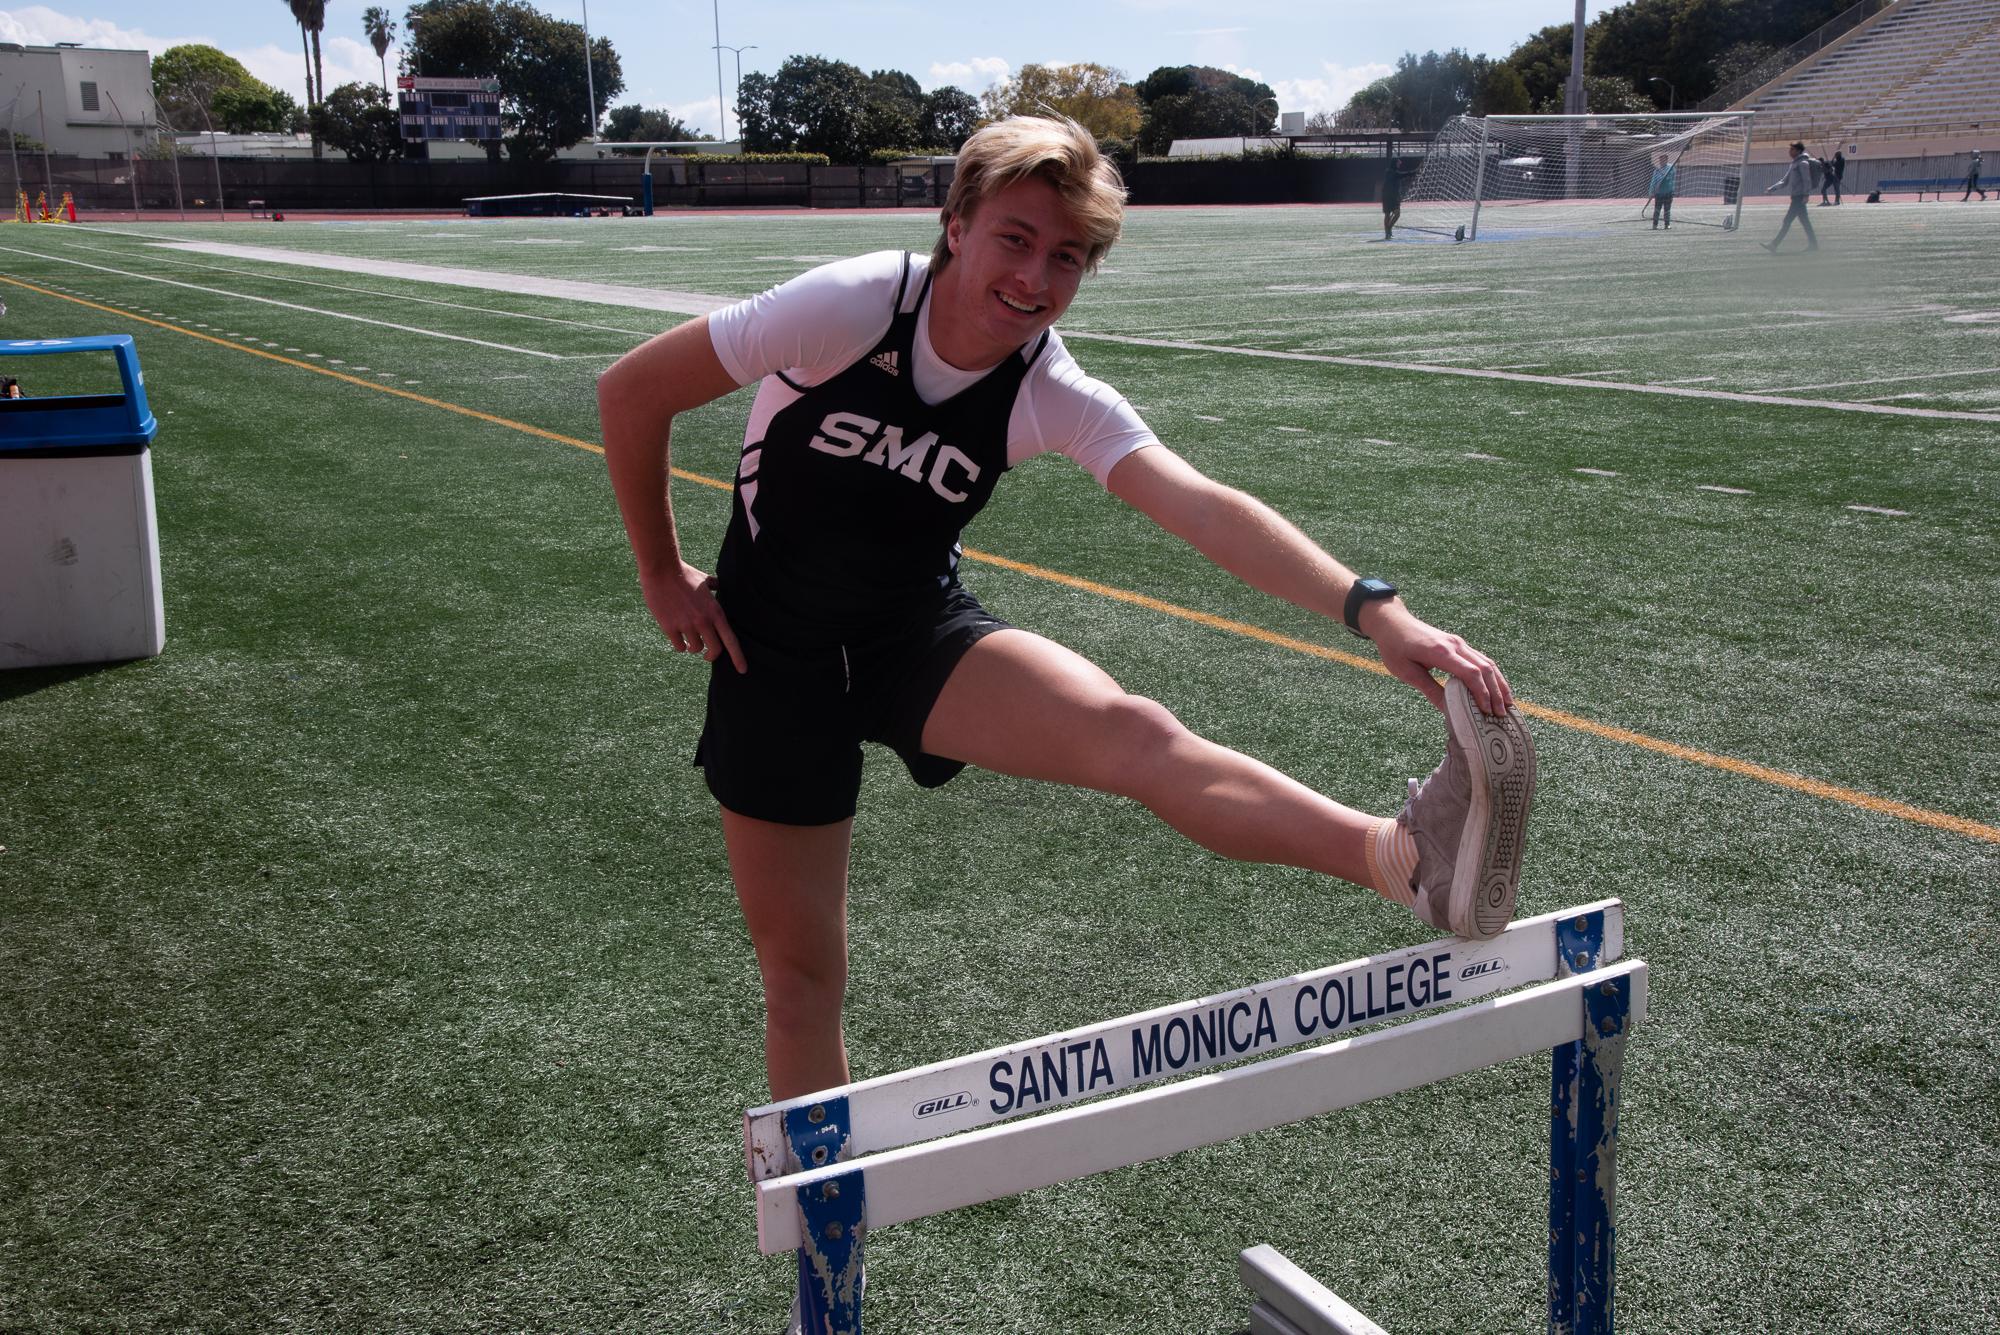 Santa Monica College located on the track field on February 20 2019 Long distance runner Leonard McCommas . ( Clyde Bates Jr. / The Corsair)